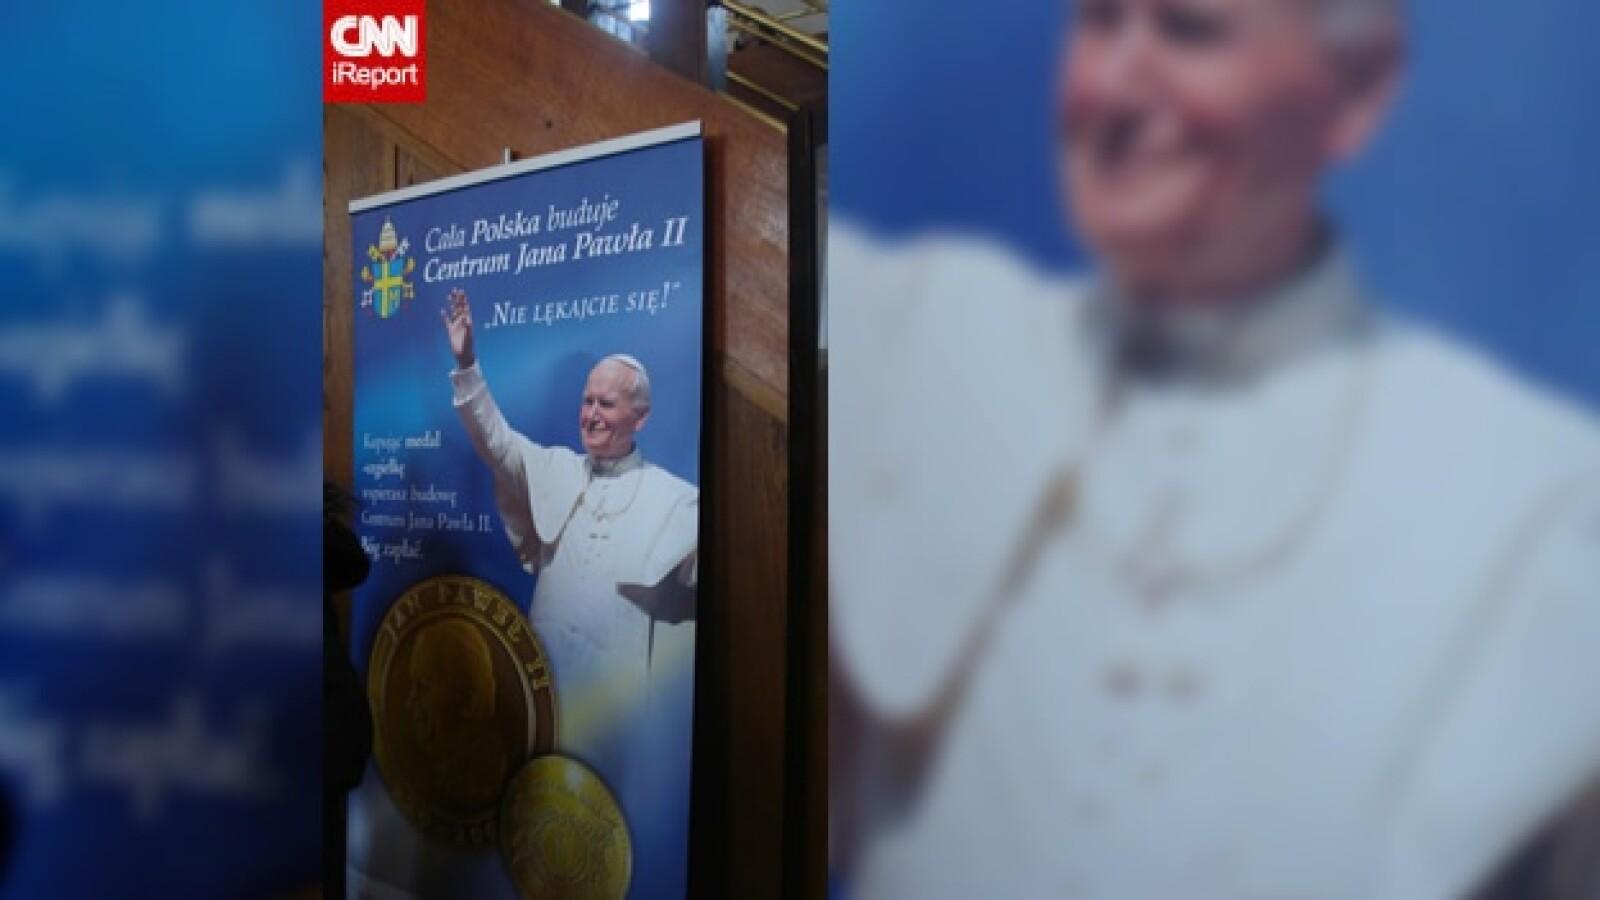 iReport Juan Pablo II Polonia03